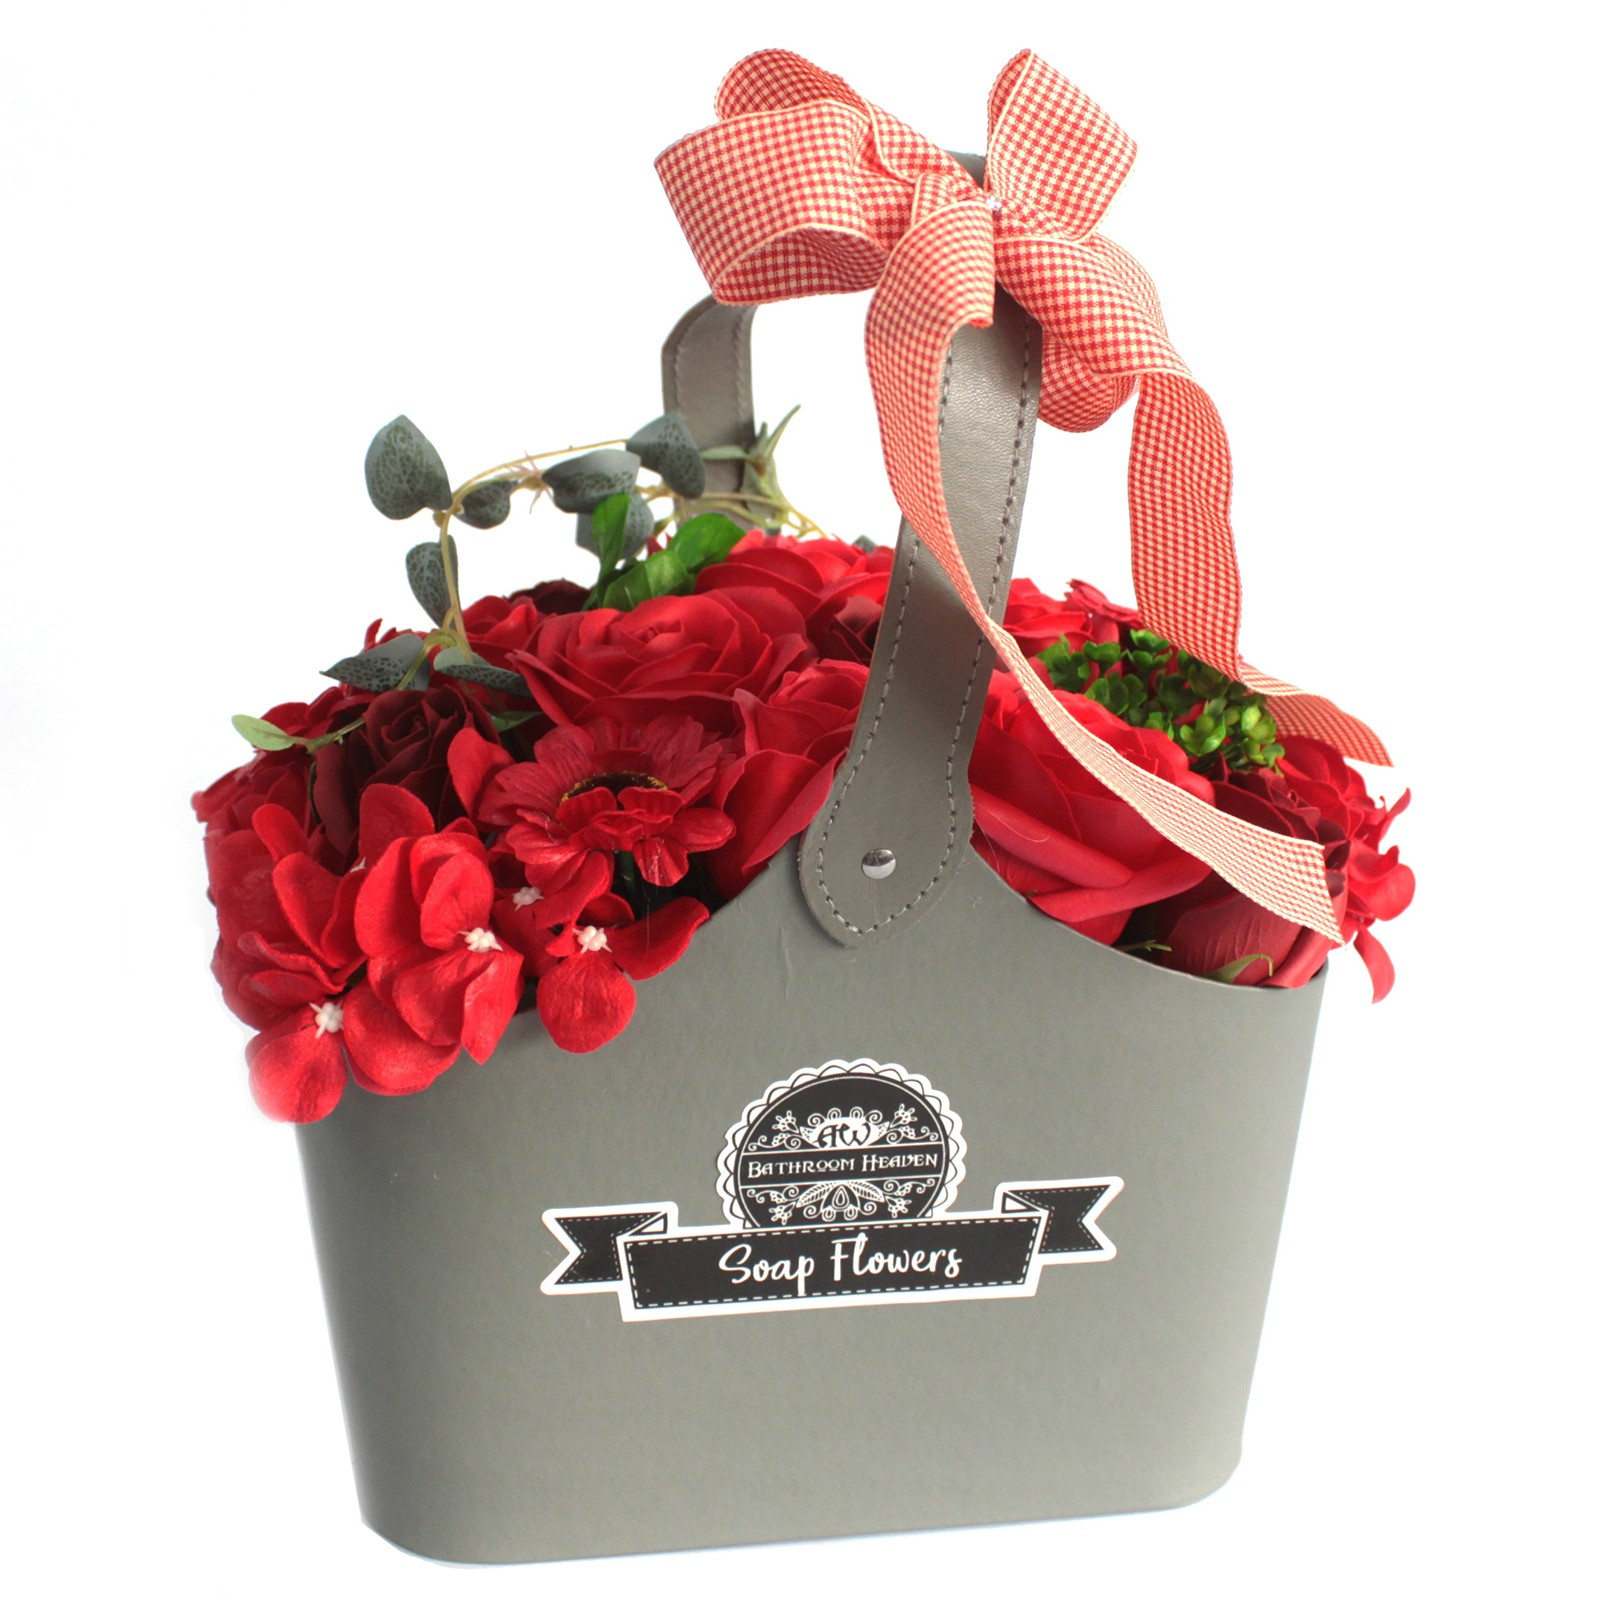 Basket Soap Flower Bouquet Red